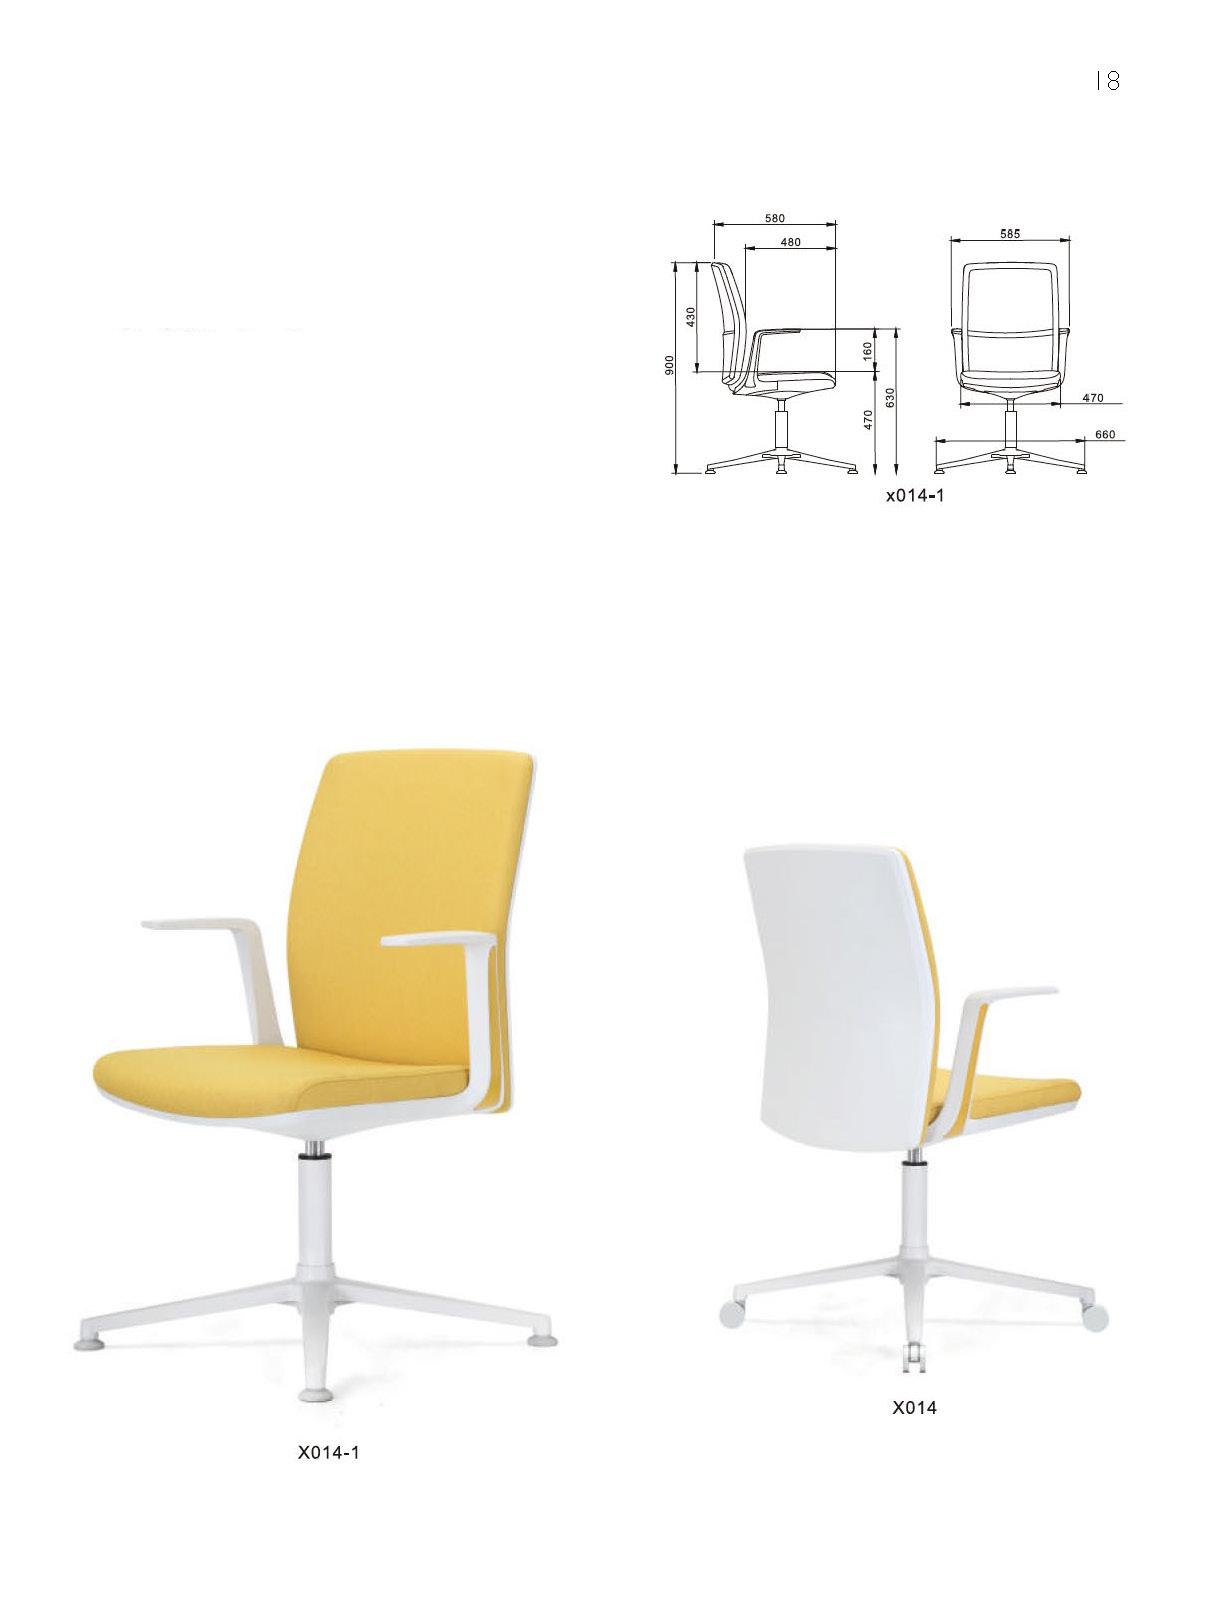 Top Furniture Catalog 2019_Page_18.jpg